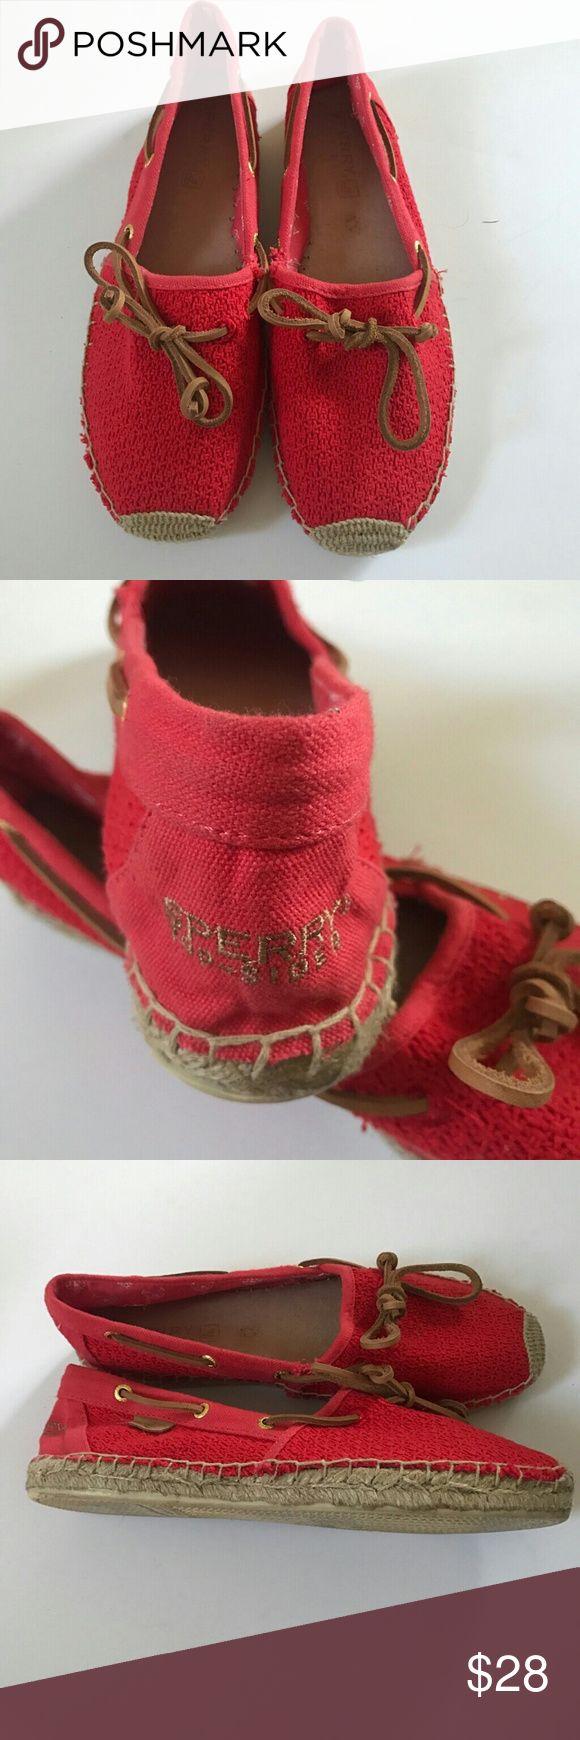 🐰🎉Sale 🐰🎉Sperry Katama Cotton Mesh Boat Shoes Sperry Women's Katama Open Cotton Mesh Boat Shoes Sperry Top-Sider Shoes Espadrilles